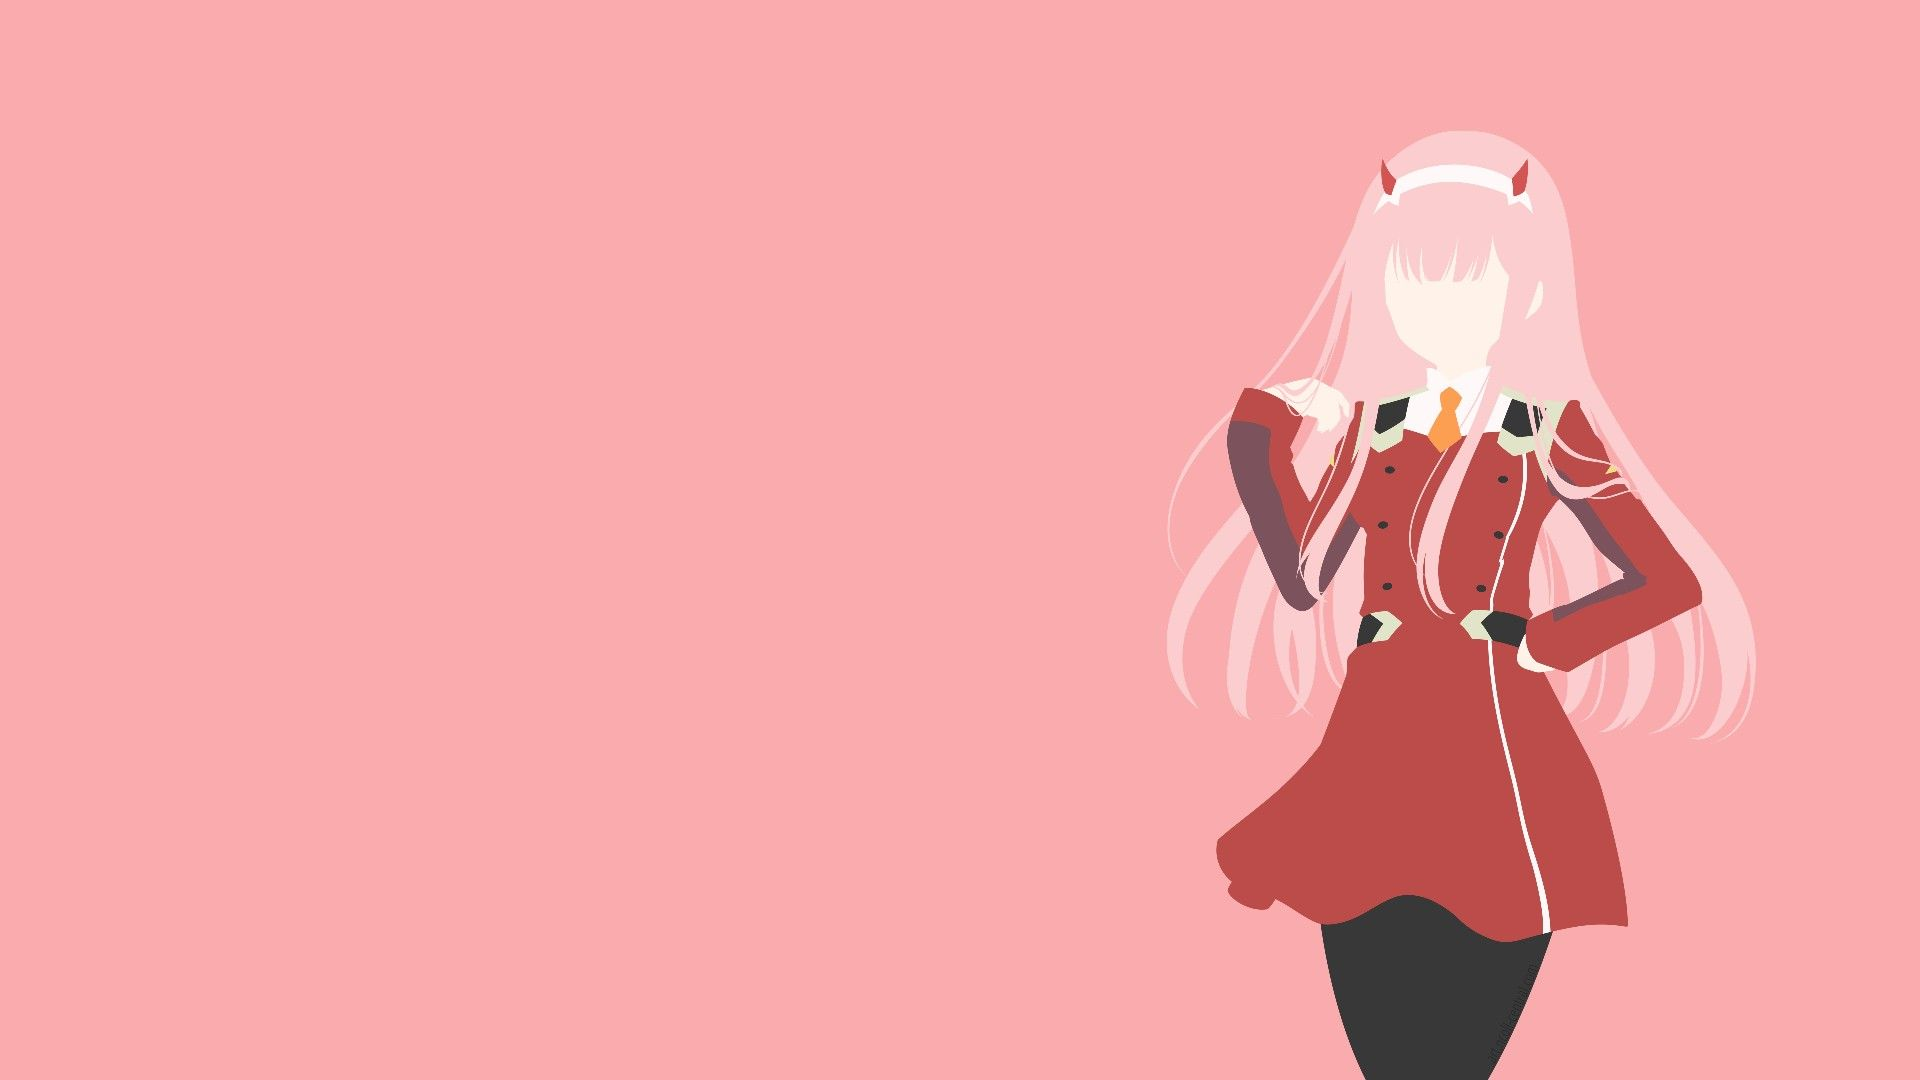 Pin On Hya 0 Emo anime wallpaper for laptop